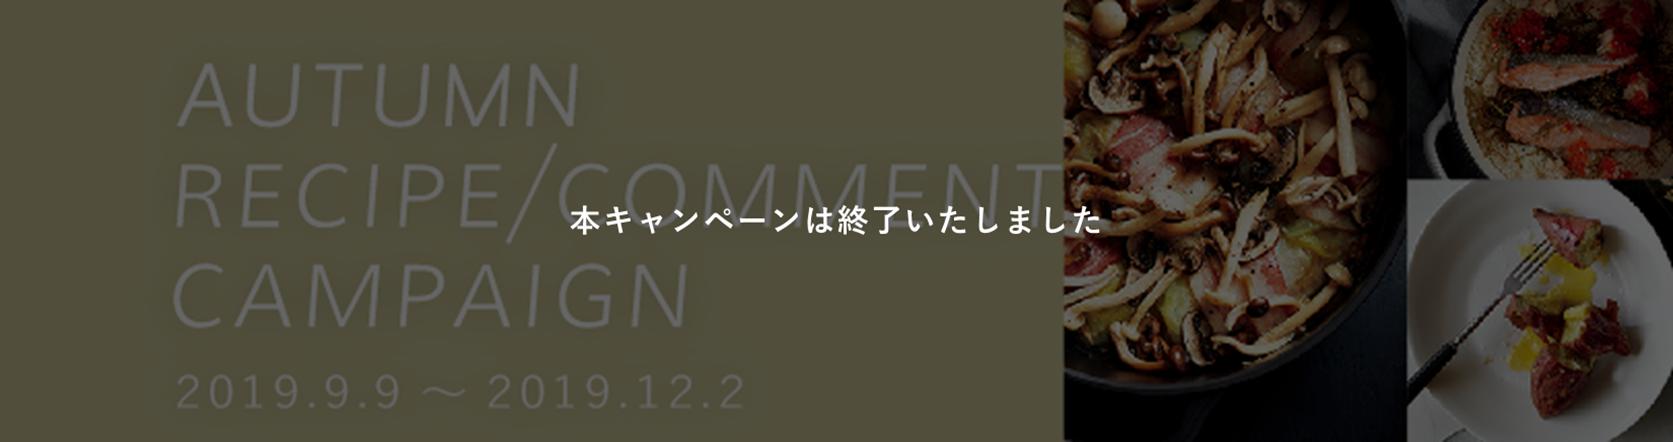 AUTUMN RECIPE/COMMENT CAMPAIGN